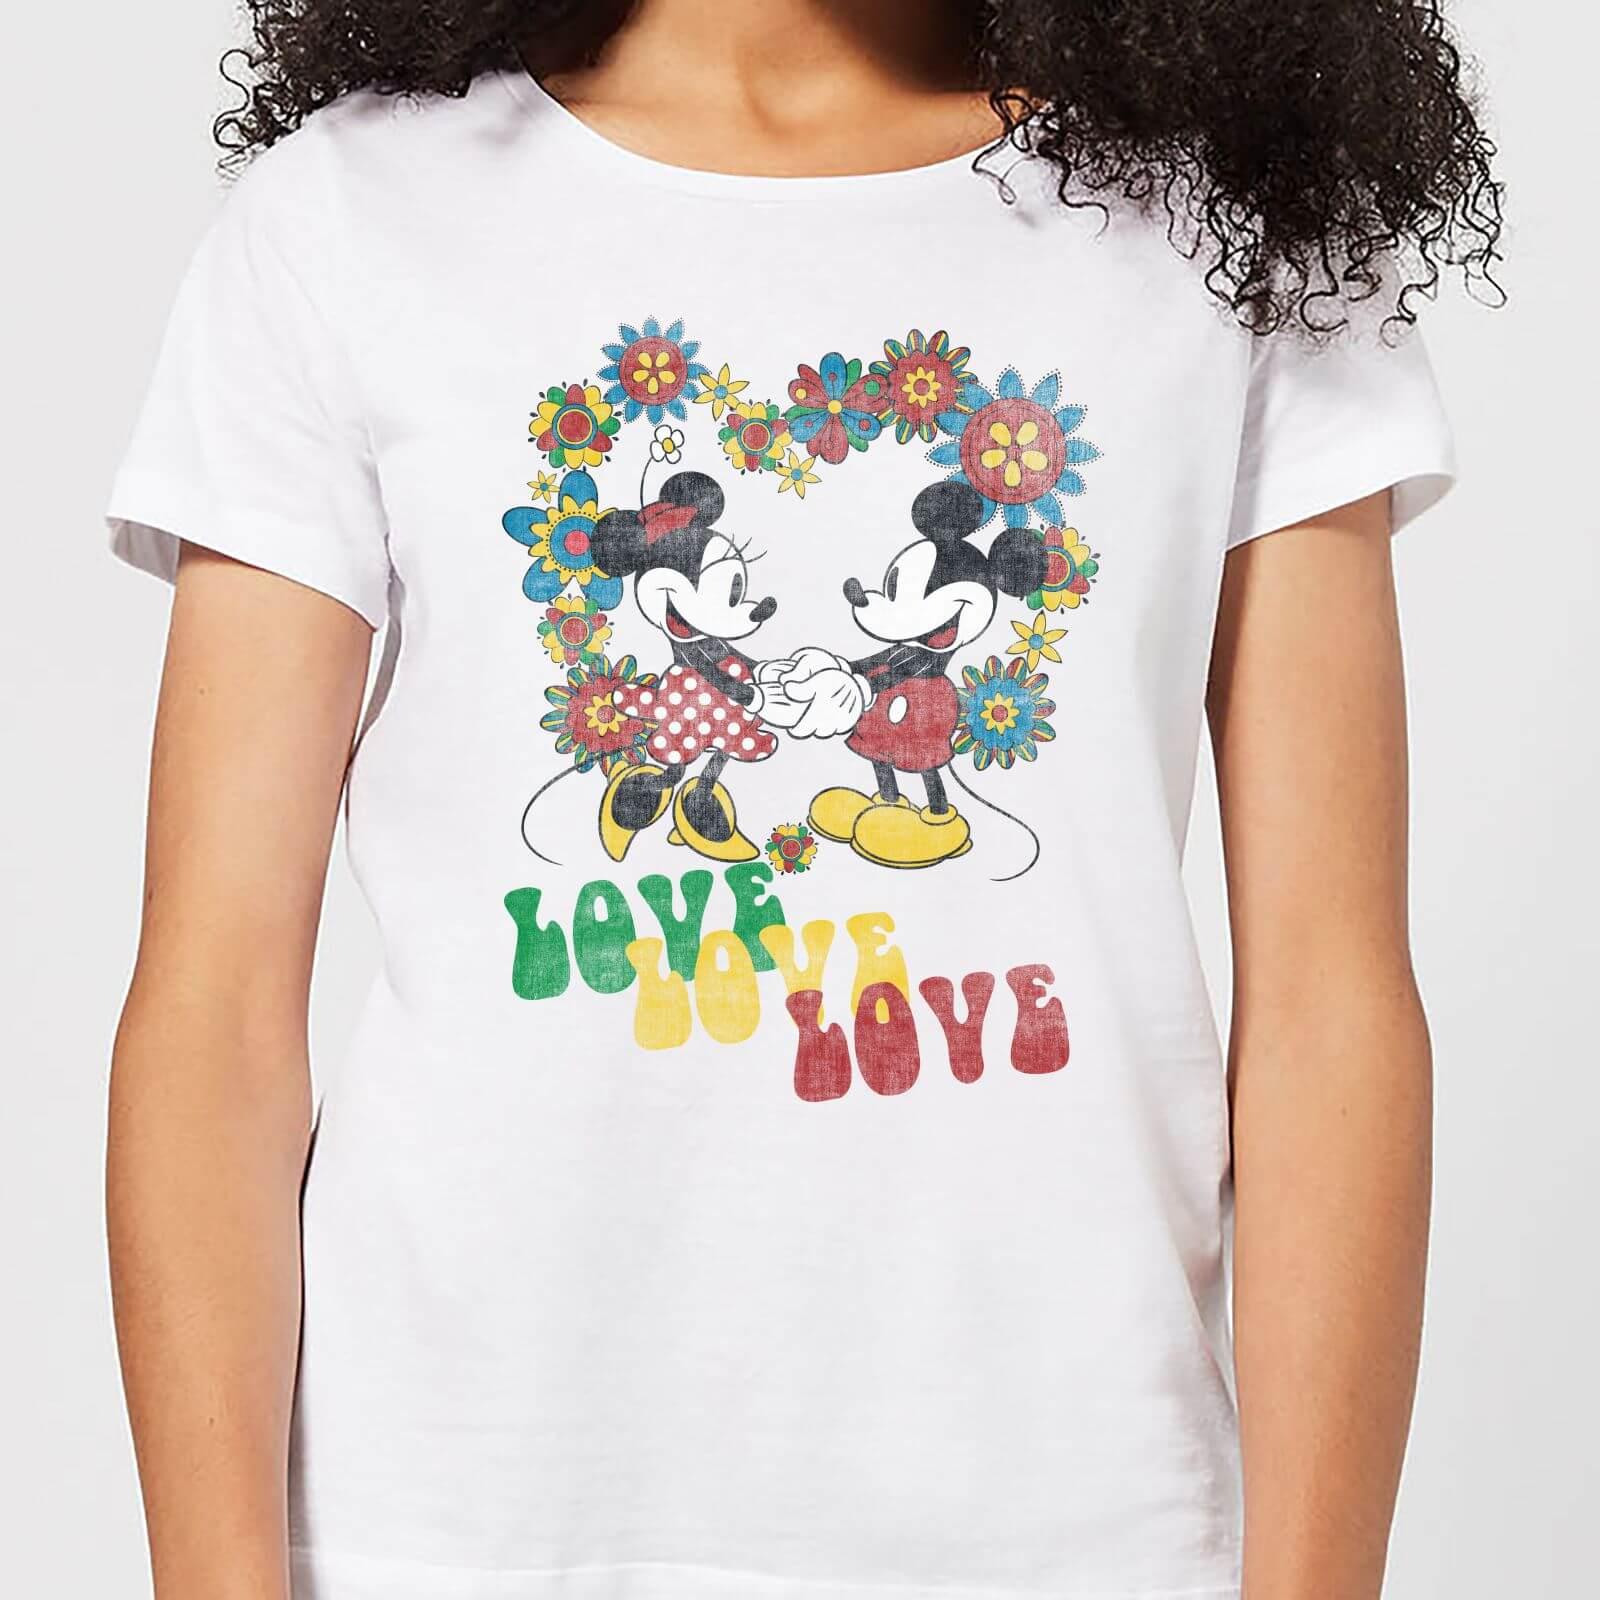 Disney Mickey Mouse Hippie Love Women's T-Shirt - White - XS - White